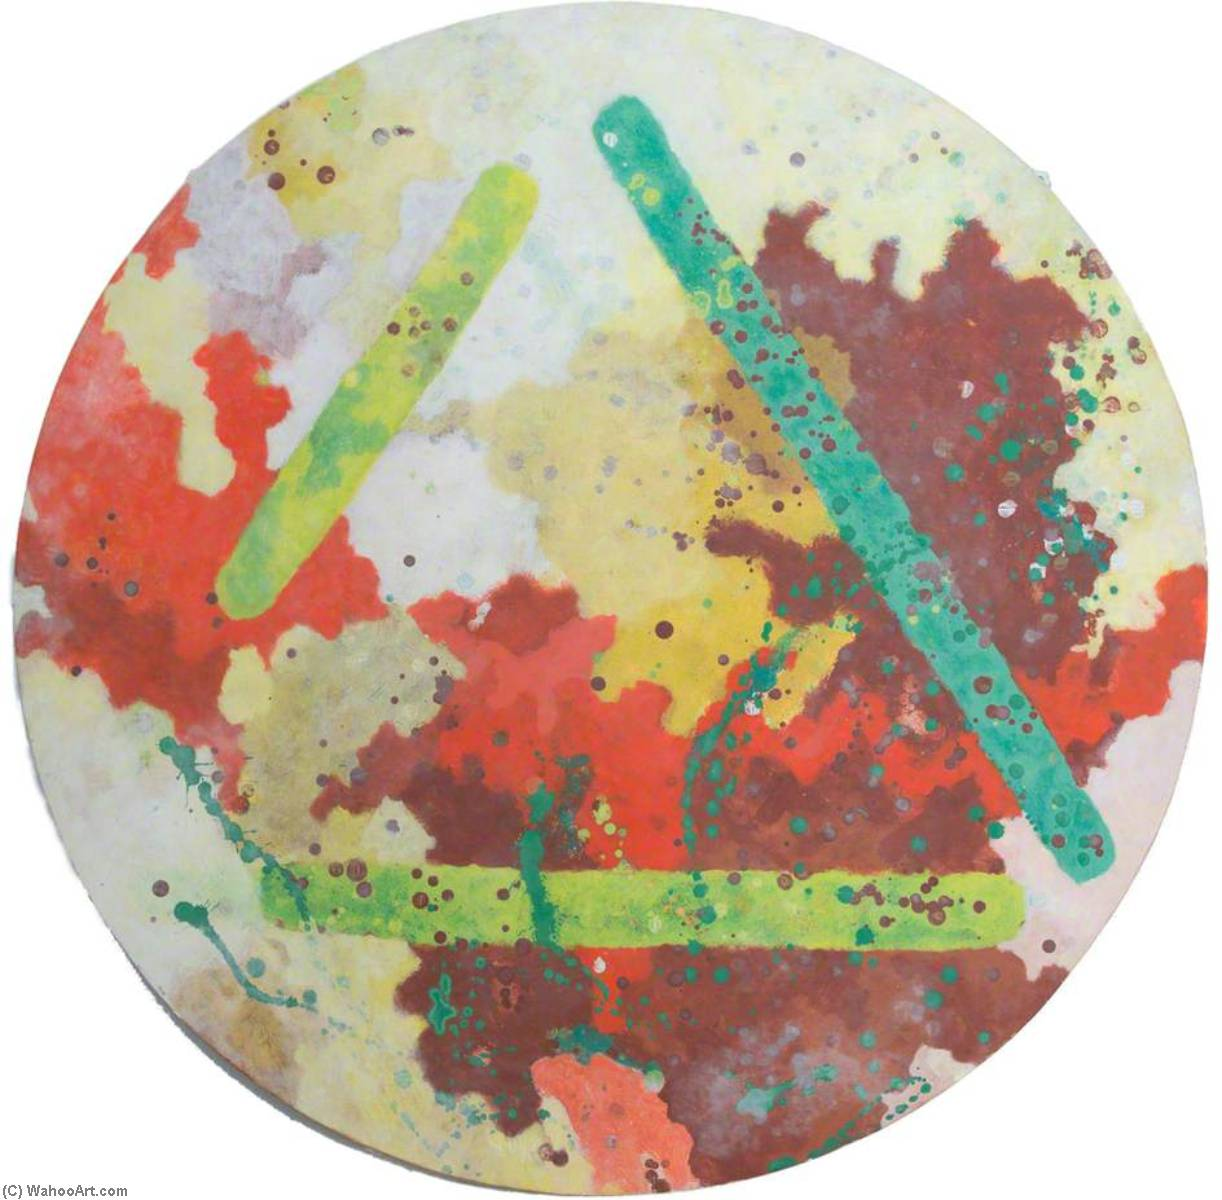 Wikioo.org - The Encyclopedia of Fine Arts - Painting, Artwork by Liza Gough Daniels - Forgotten Beauty Spots